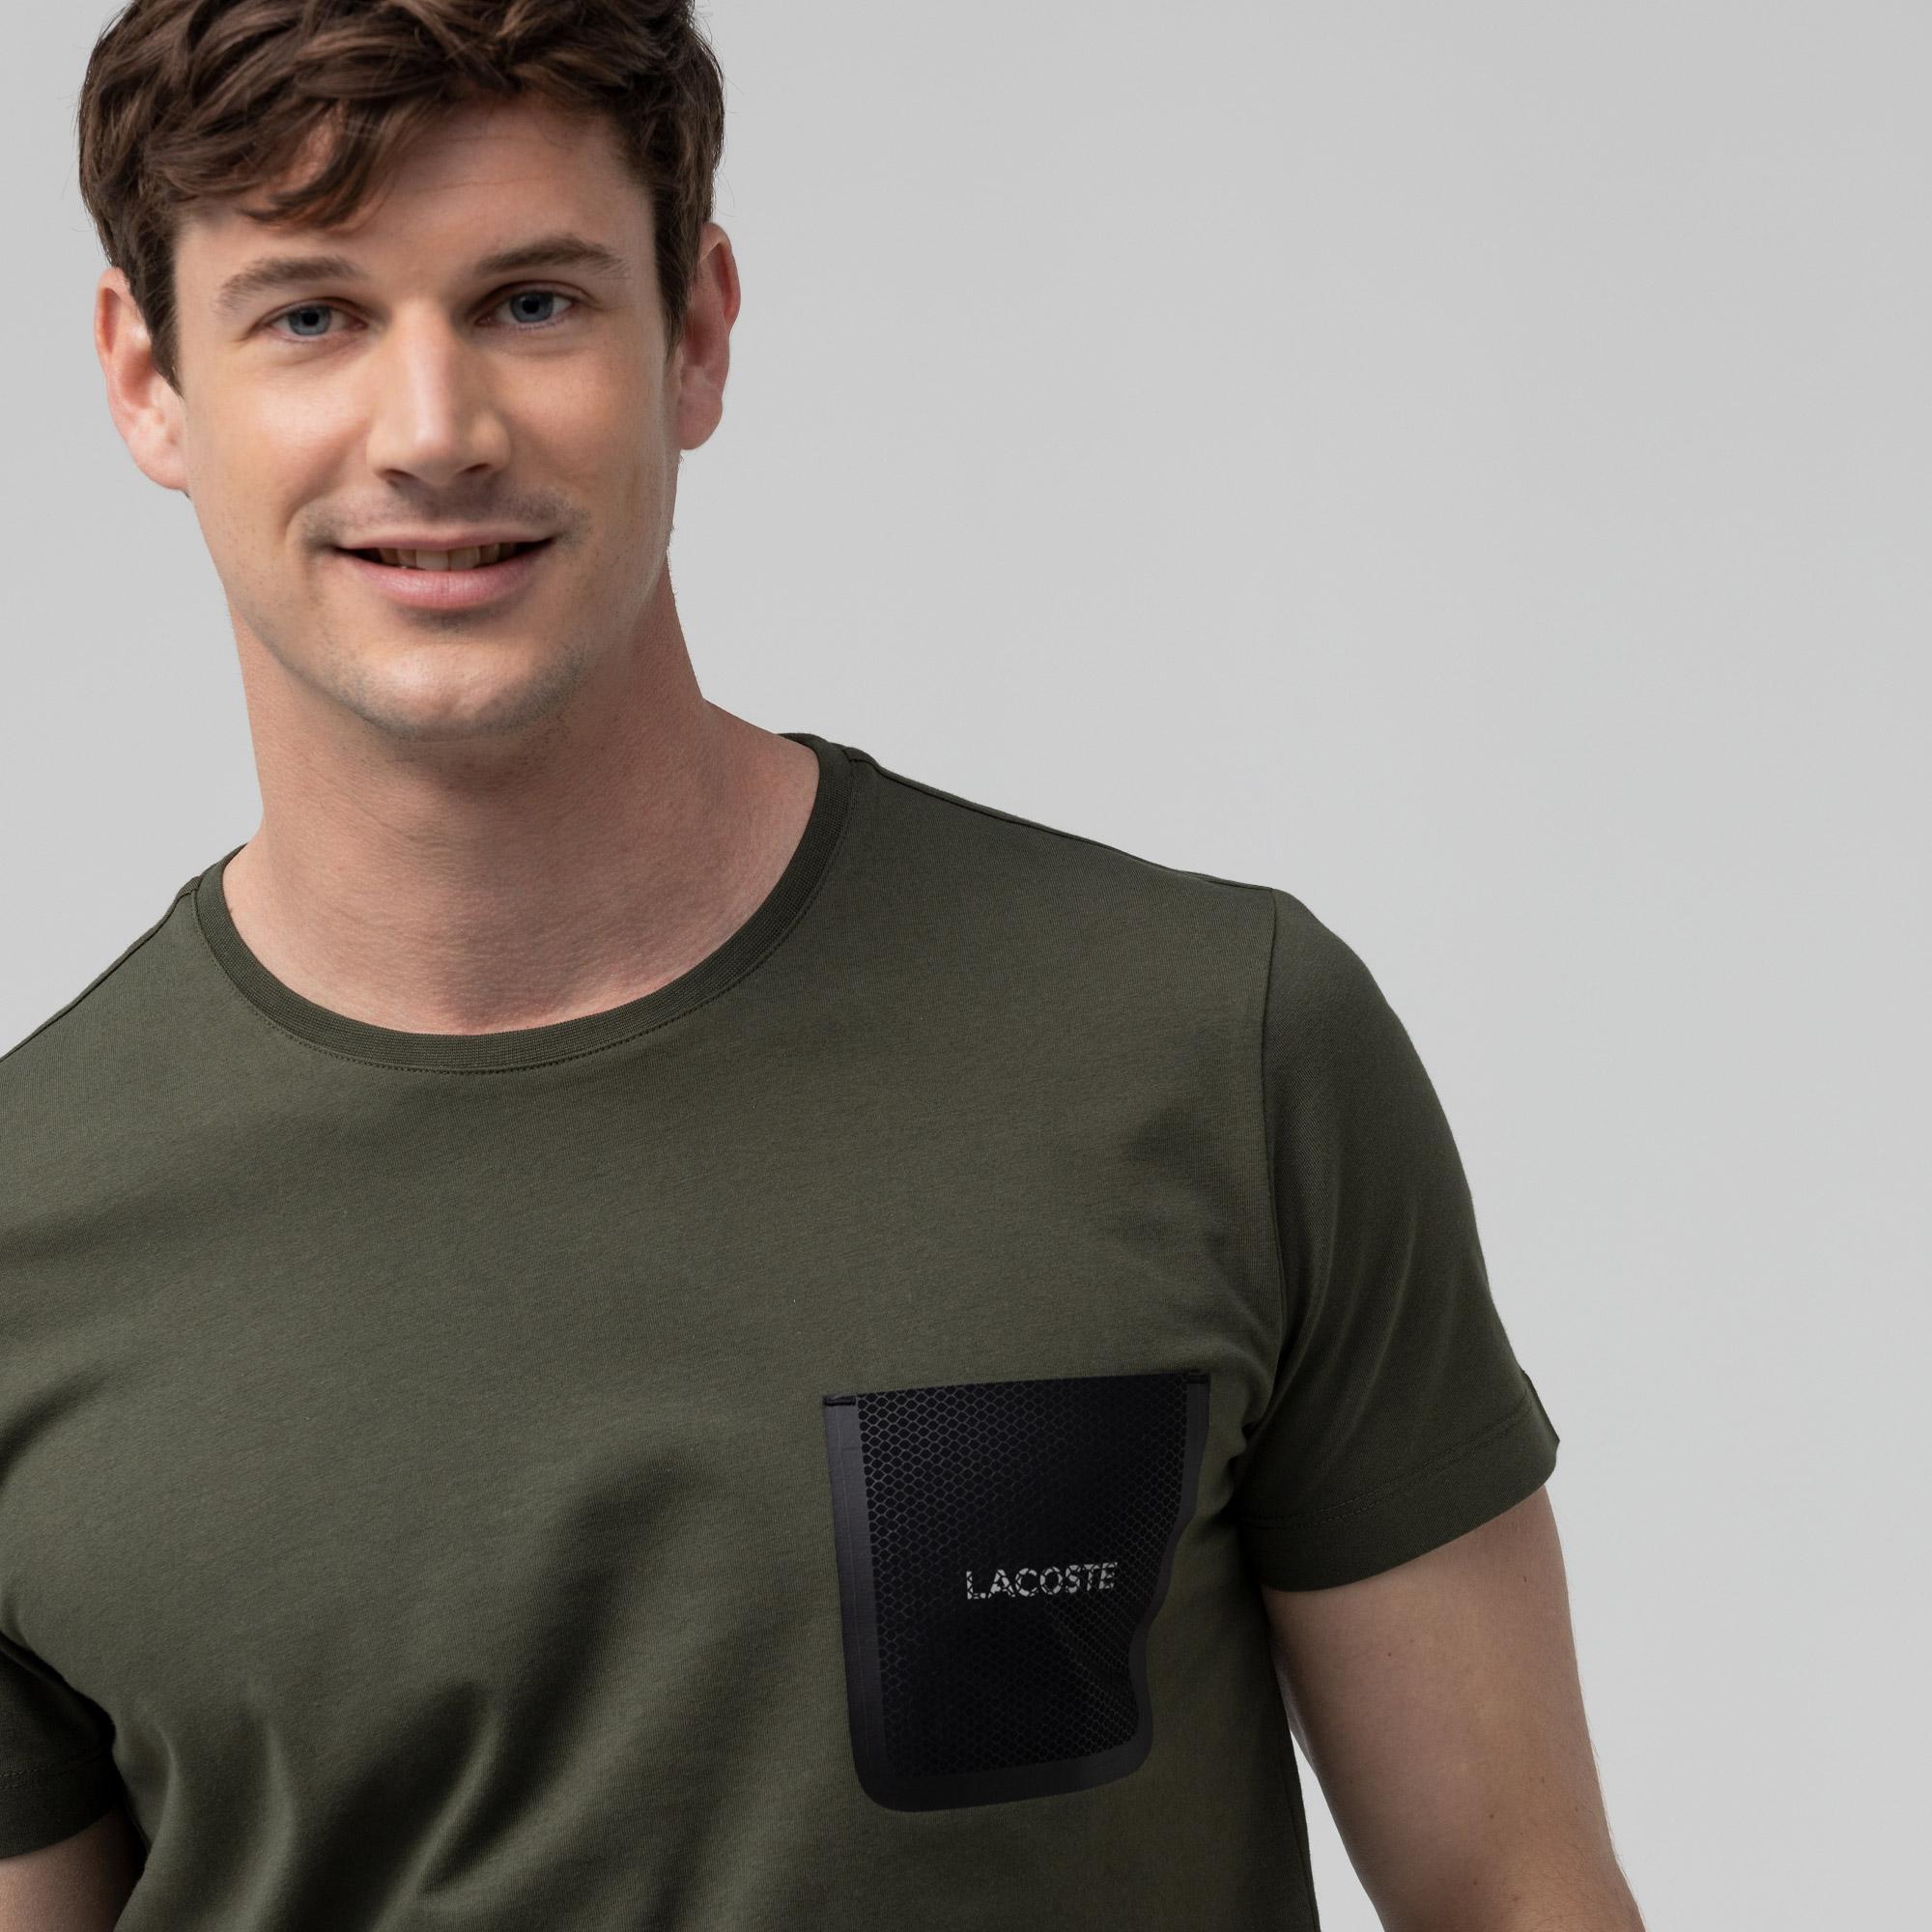 Lacoste Erkek Slim Fit Baskılı Bisiklet Yaka Haki T-Shirt